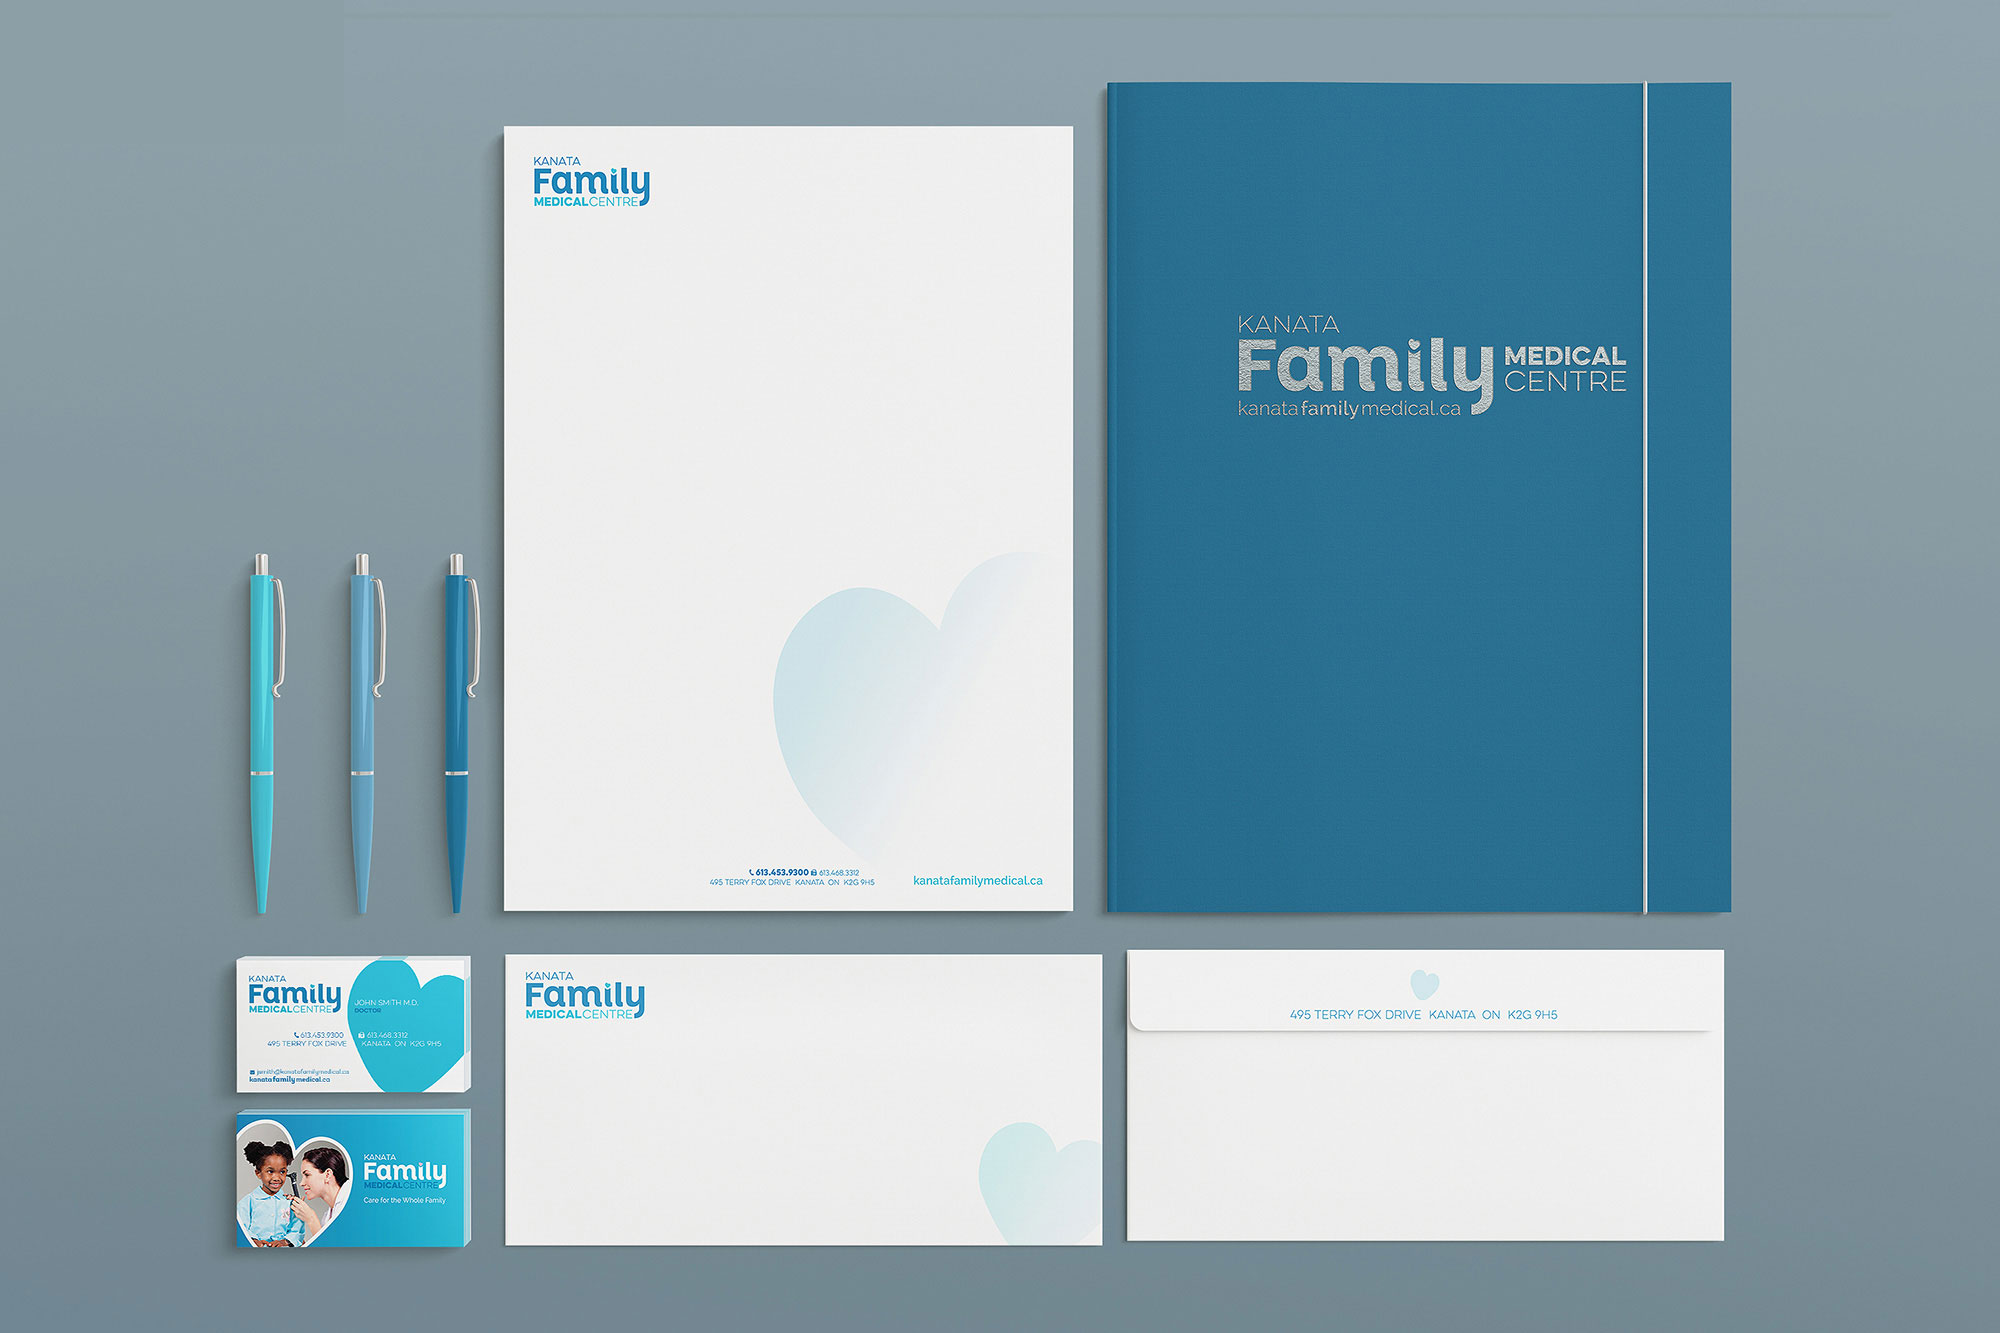 FMC-corporate-id